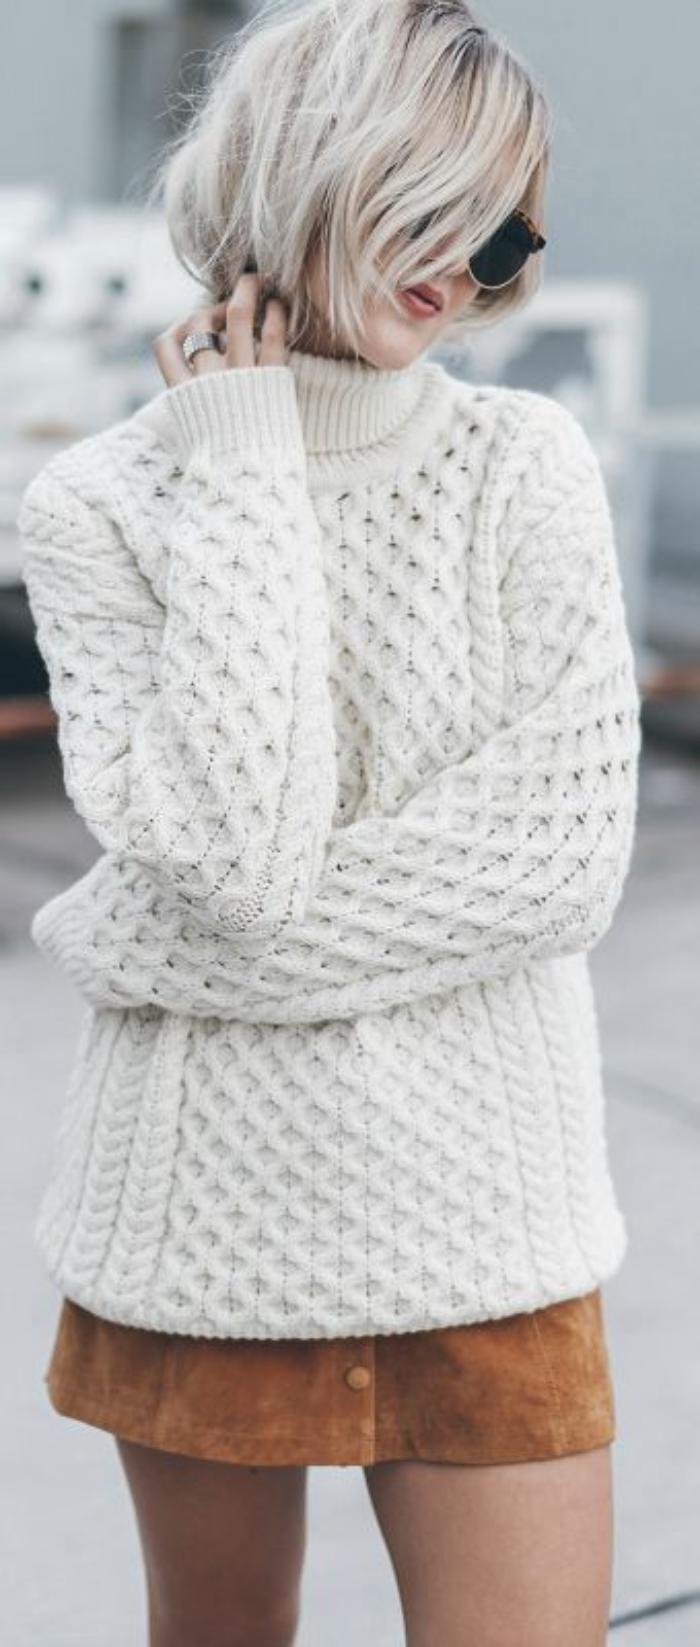 pull irlandais femmes, port avec jupe courte                                                                                                                                                                                 Plus